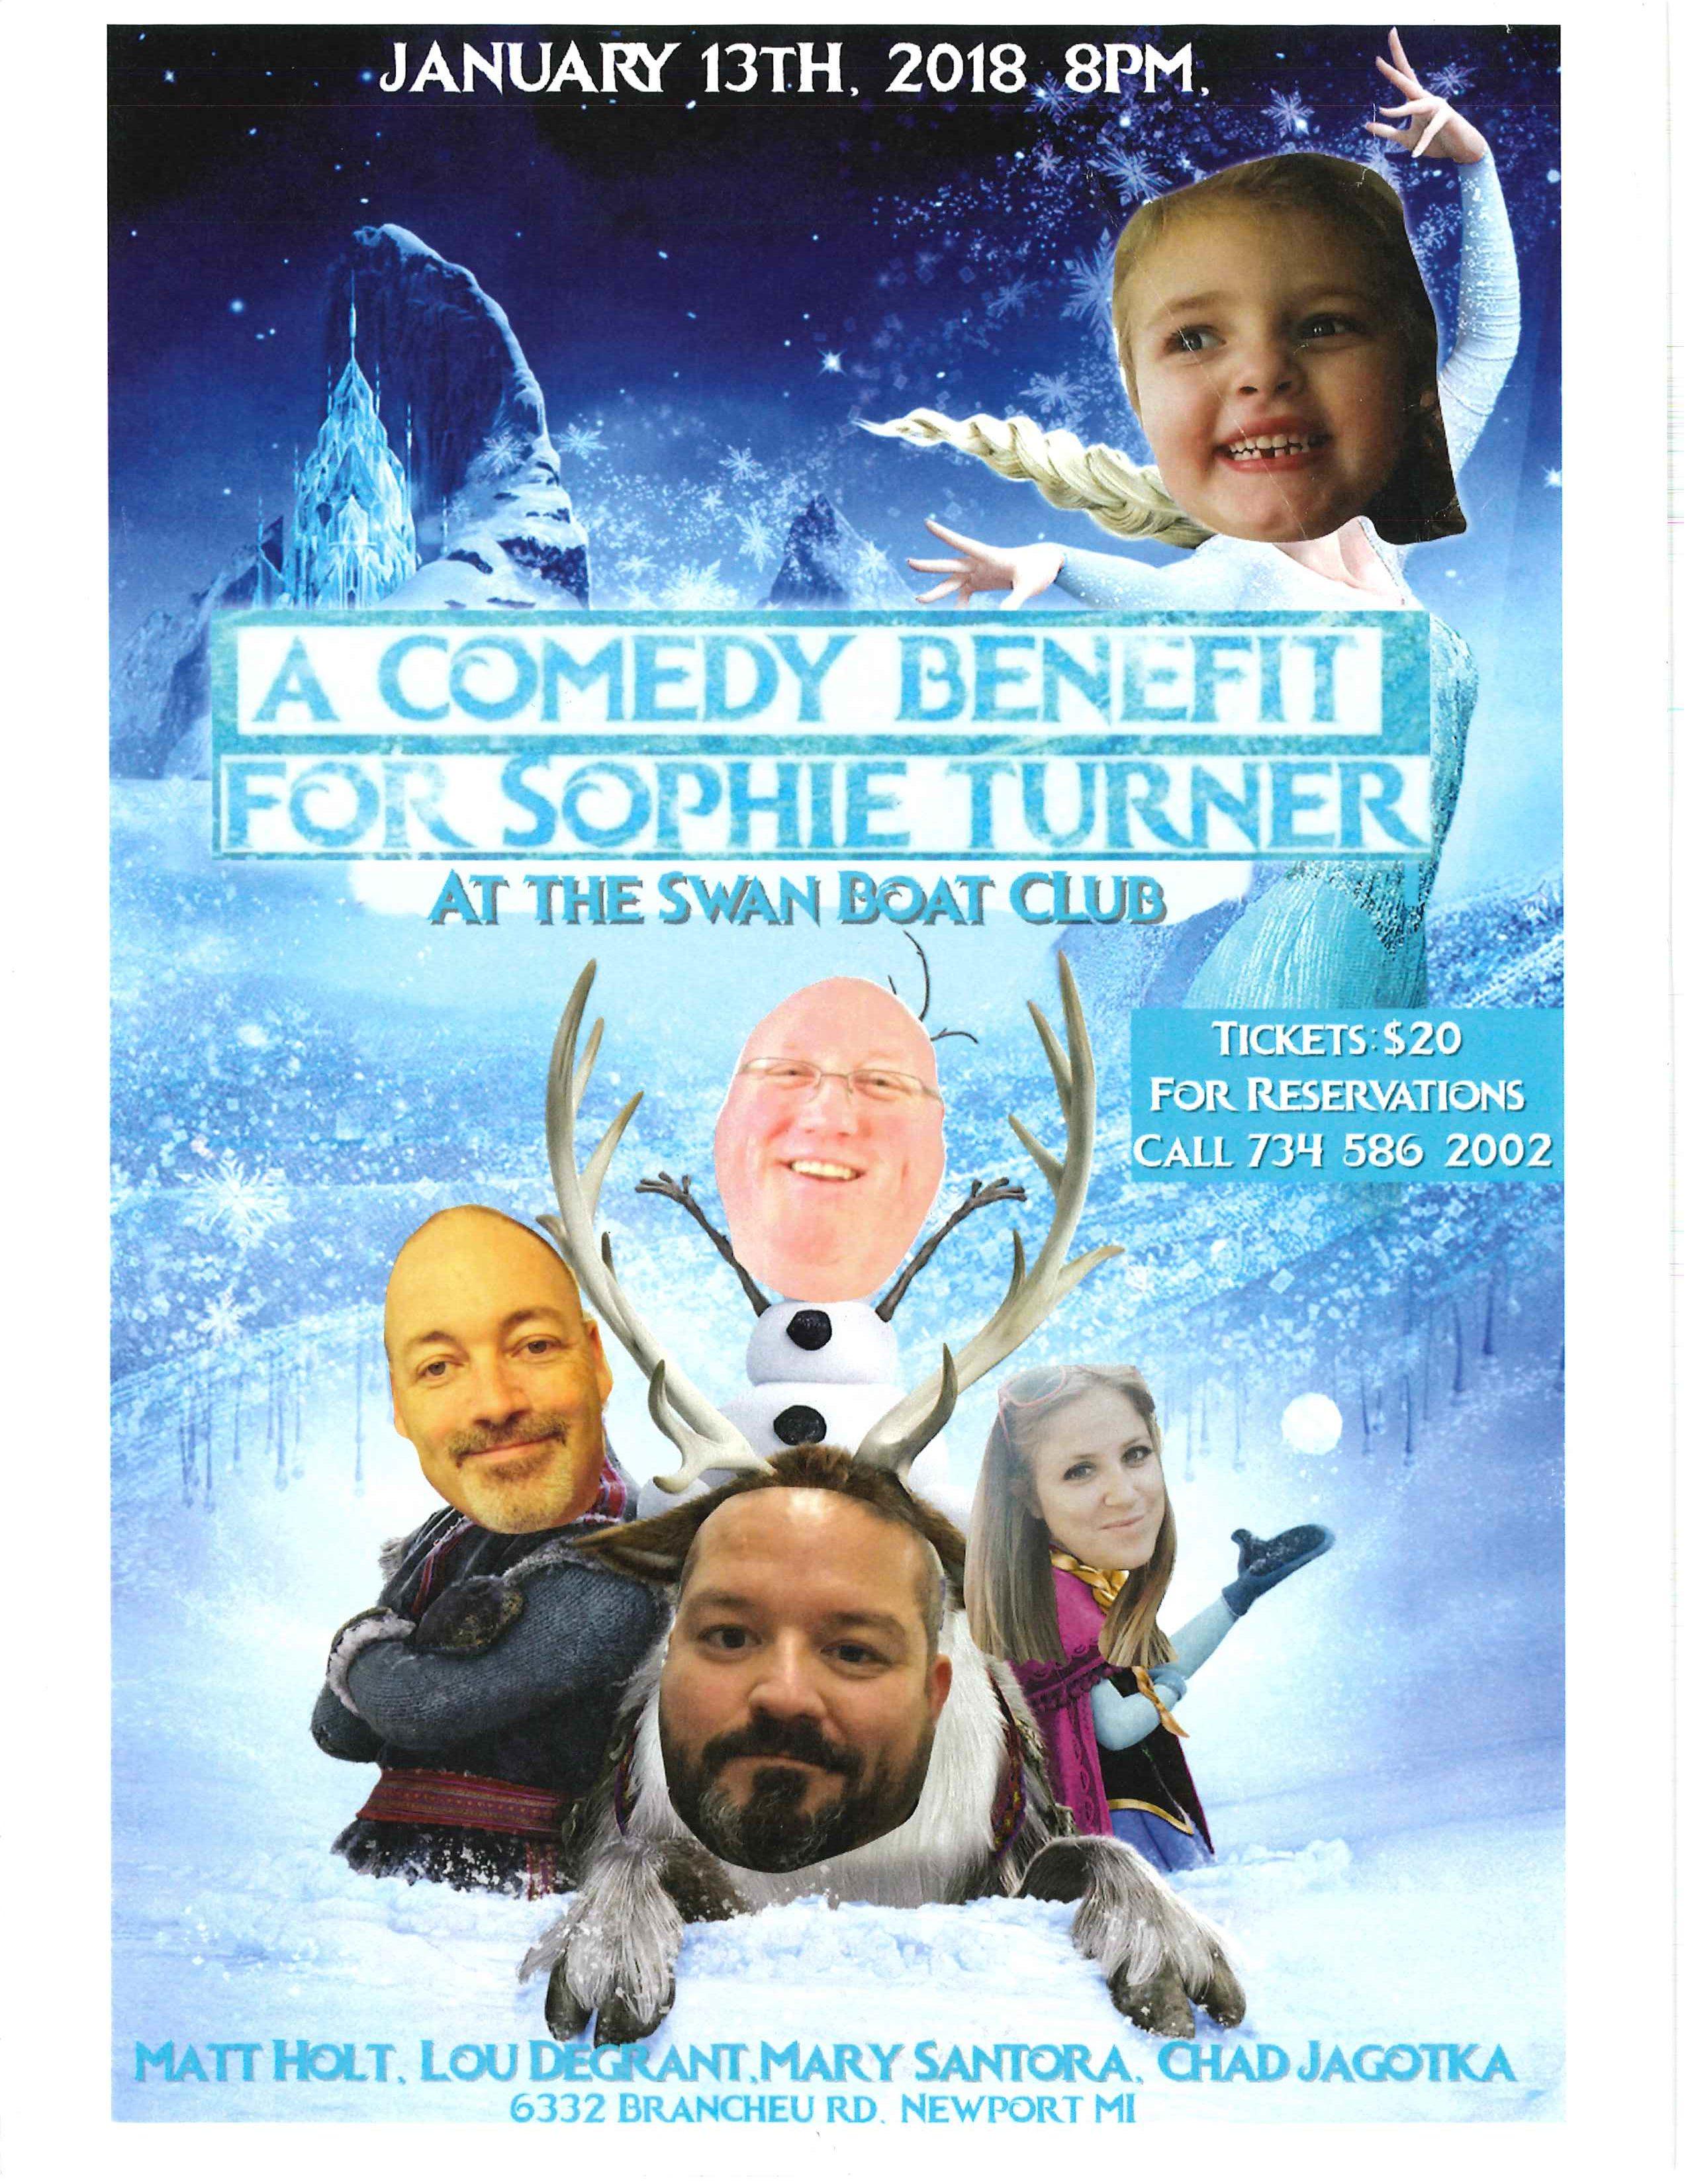 sophie turner fundraiser